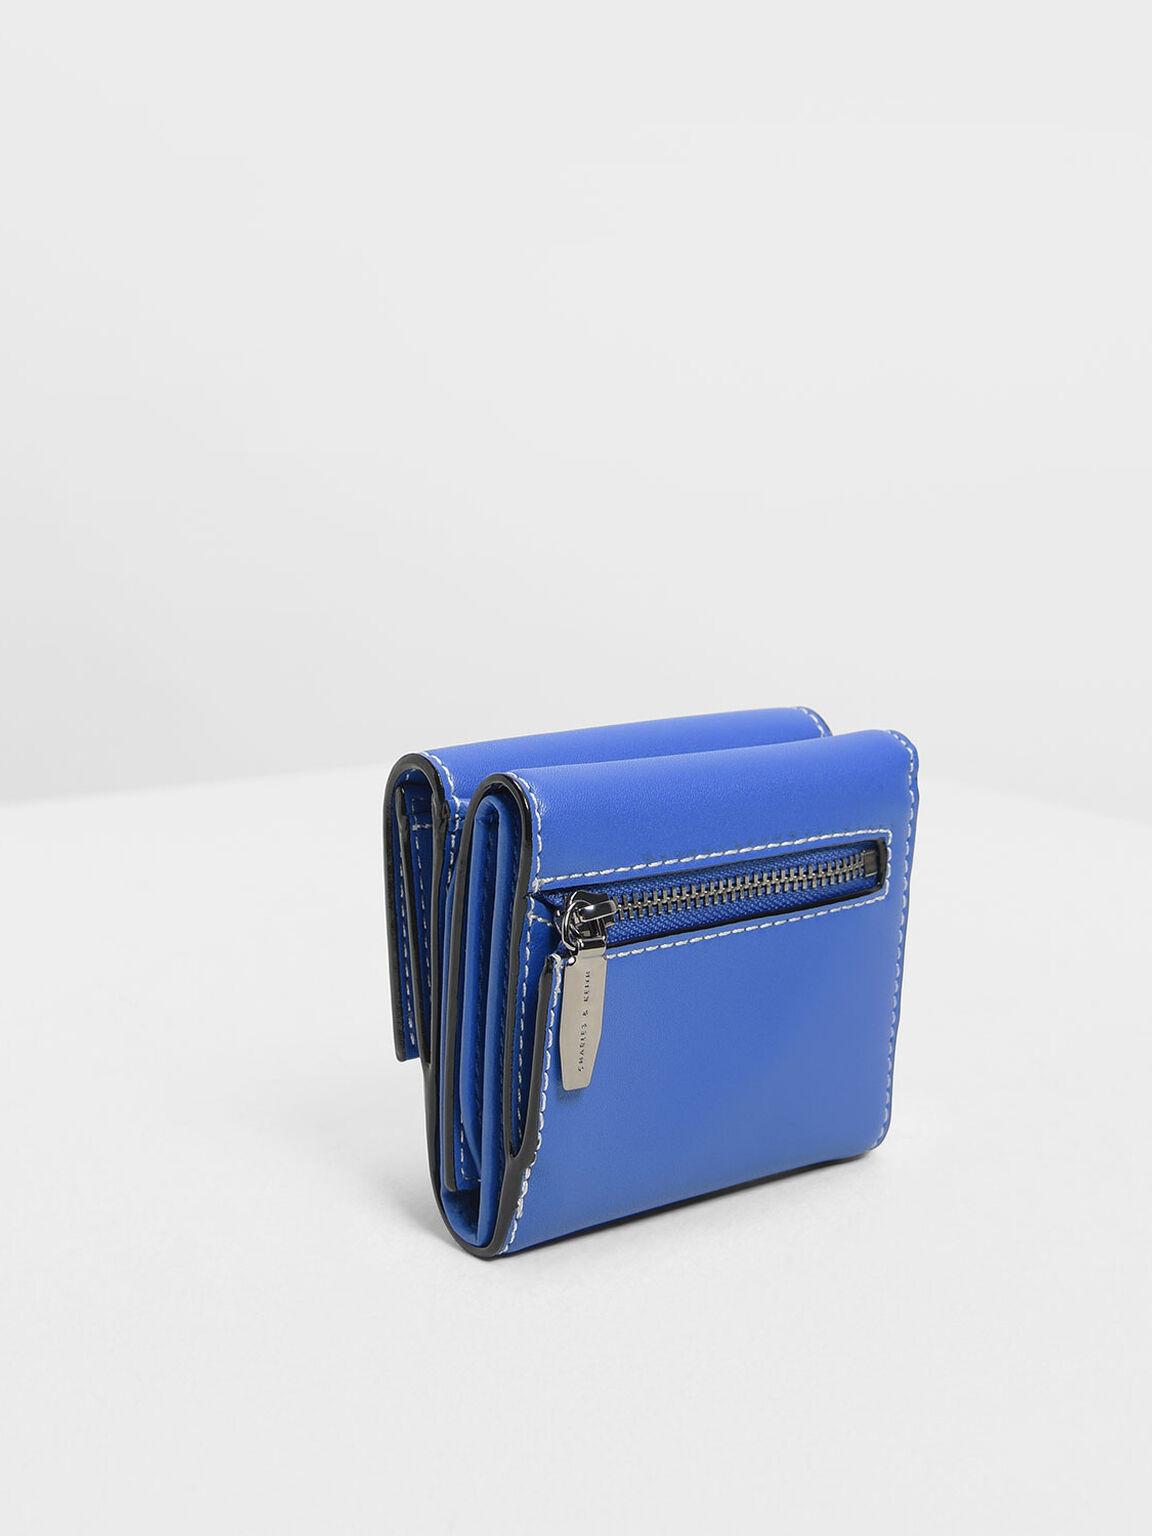 縫線滾邊掀蓋皮夾, 藍色, hi-res